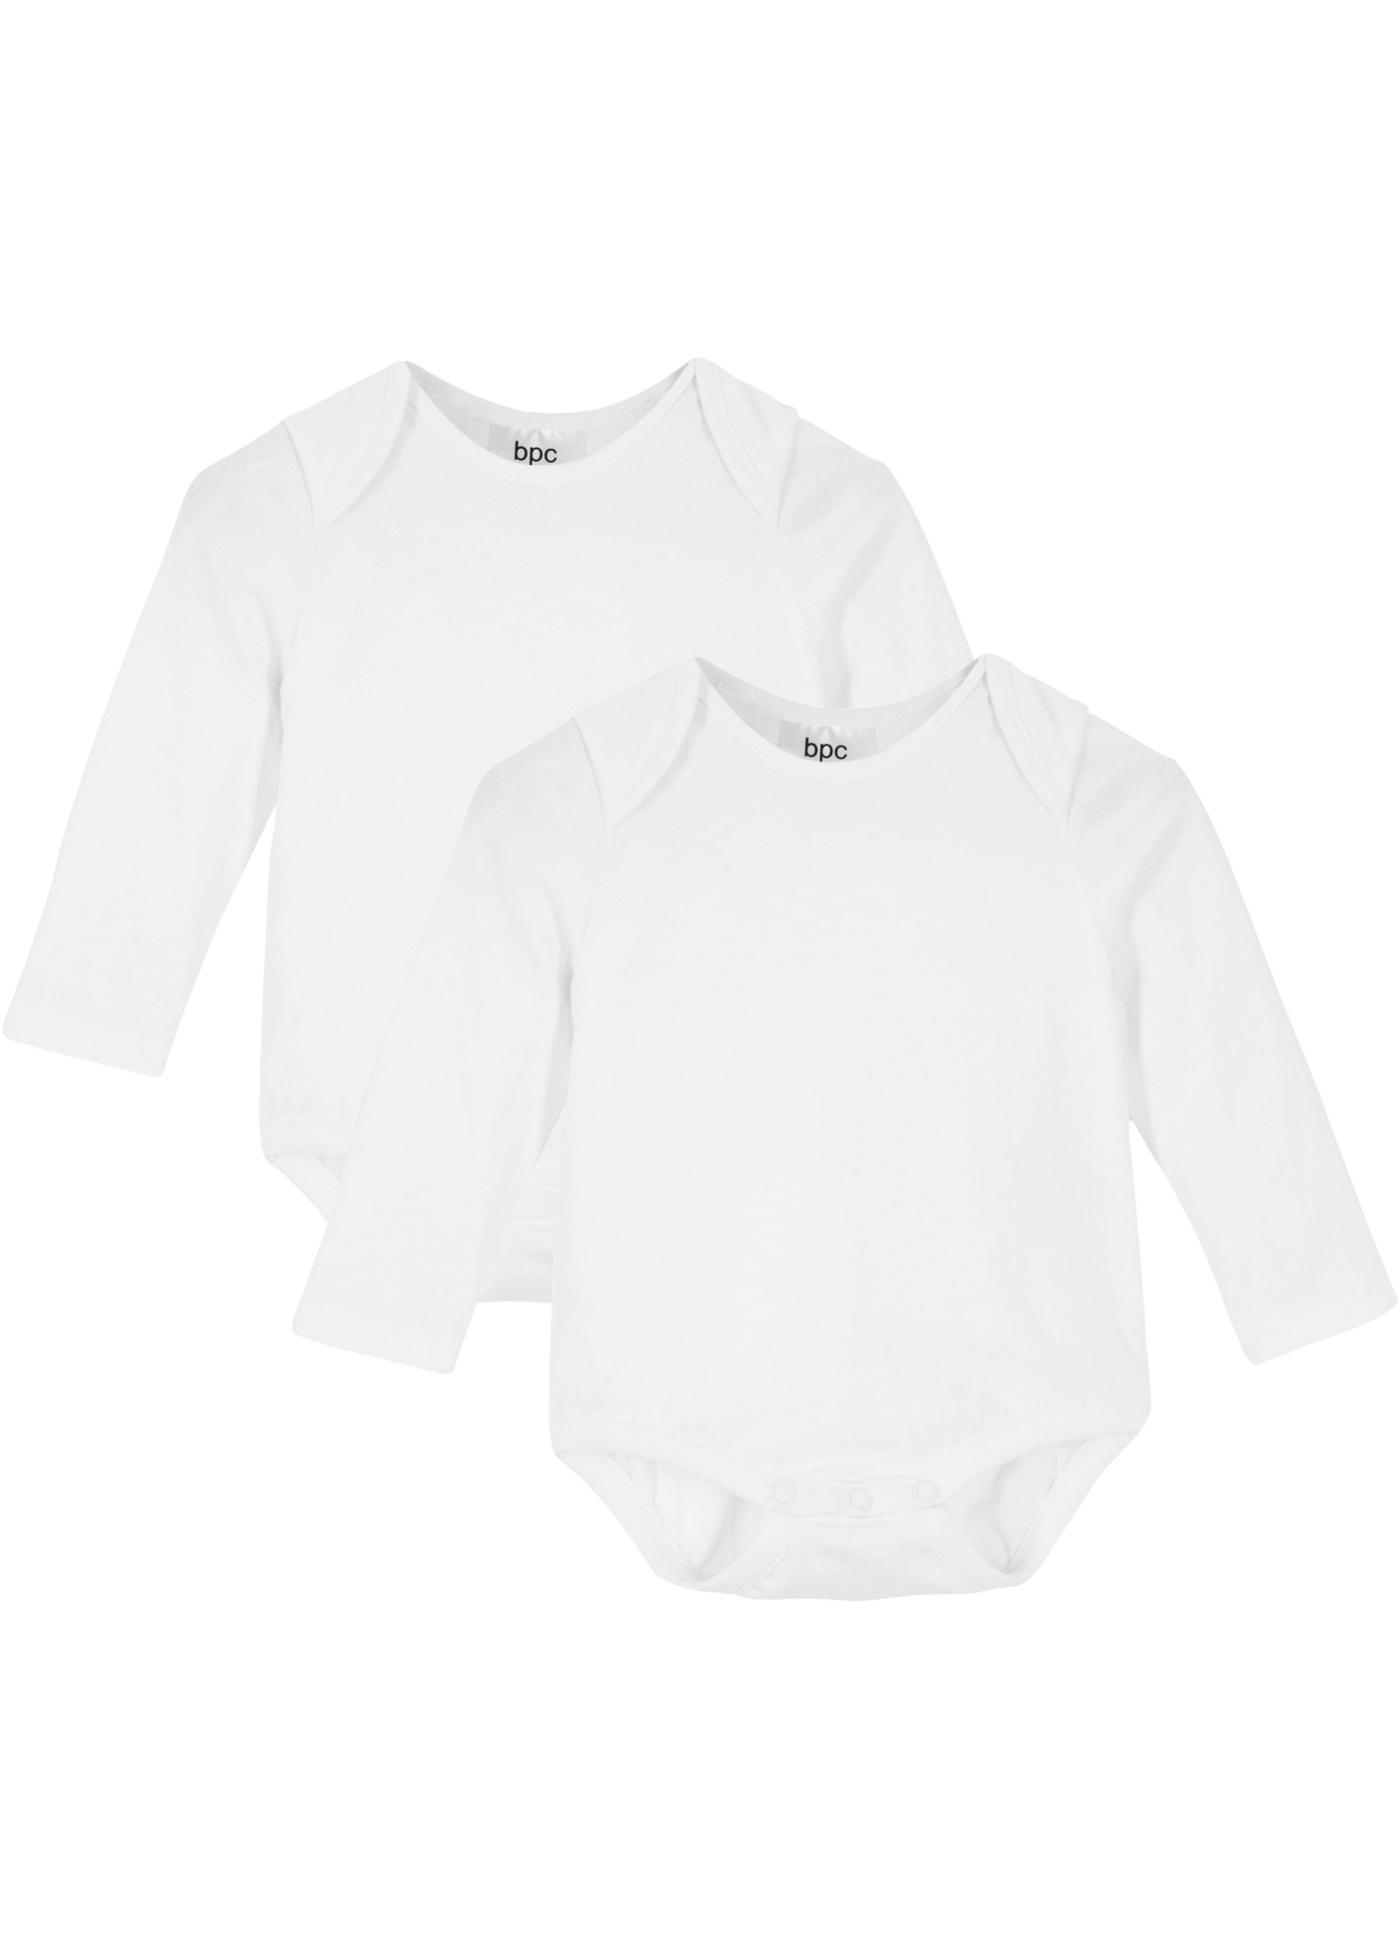 Image of Baby Langarmbody Längen verstellbar (2er-Pack) Bio-Baumwolle